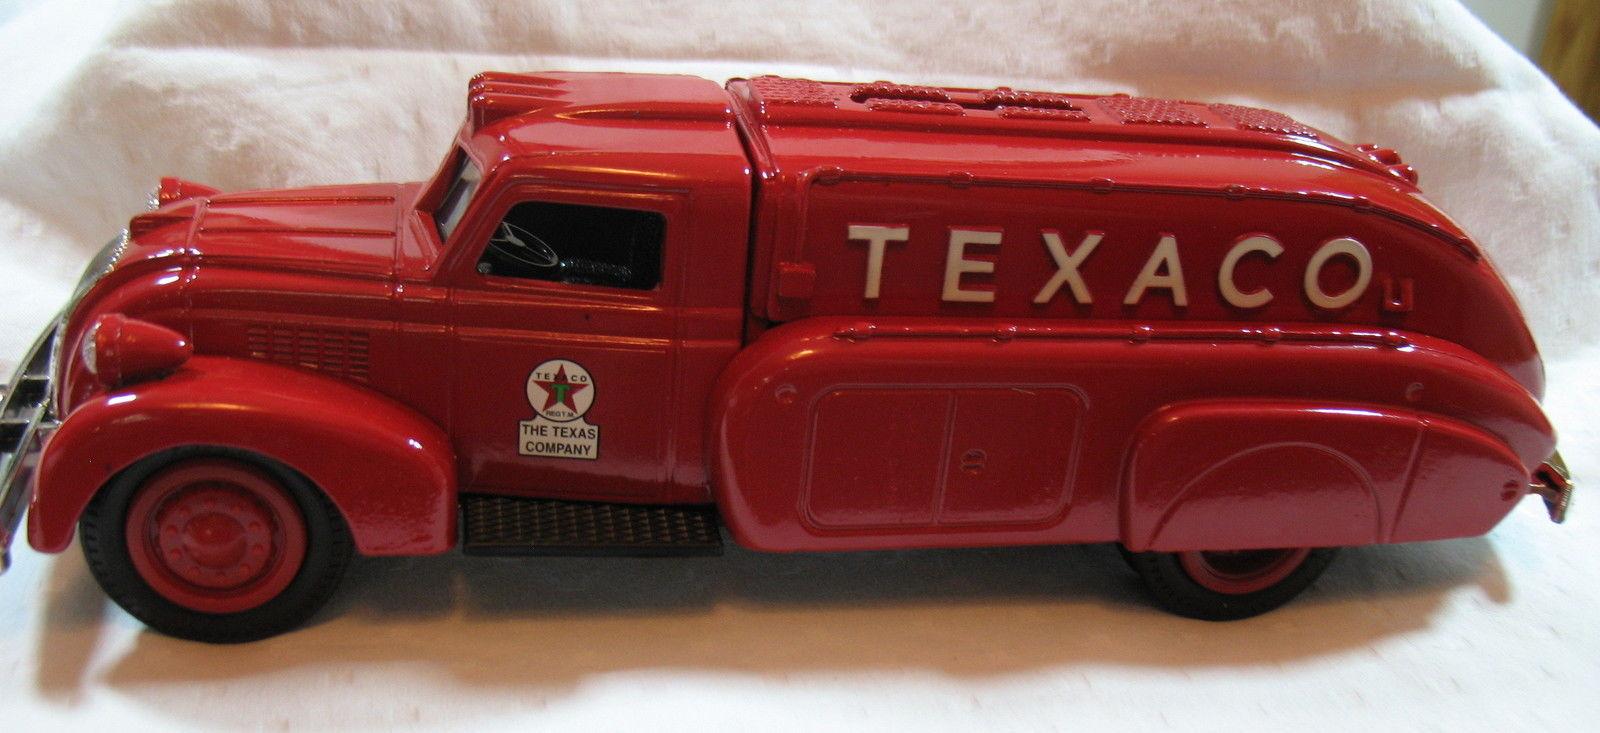 ERTL Texaco 1939 Dodge Airflow Tanker #1703 and 11 similar items